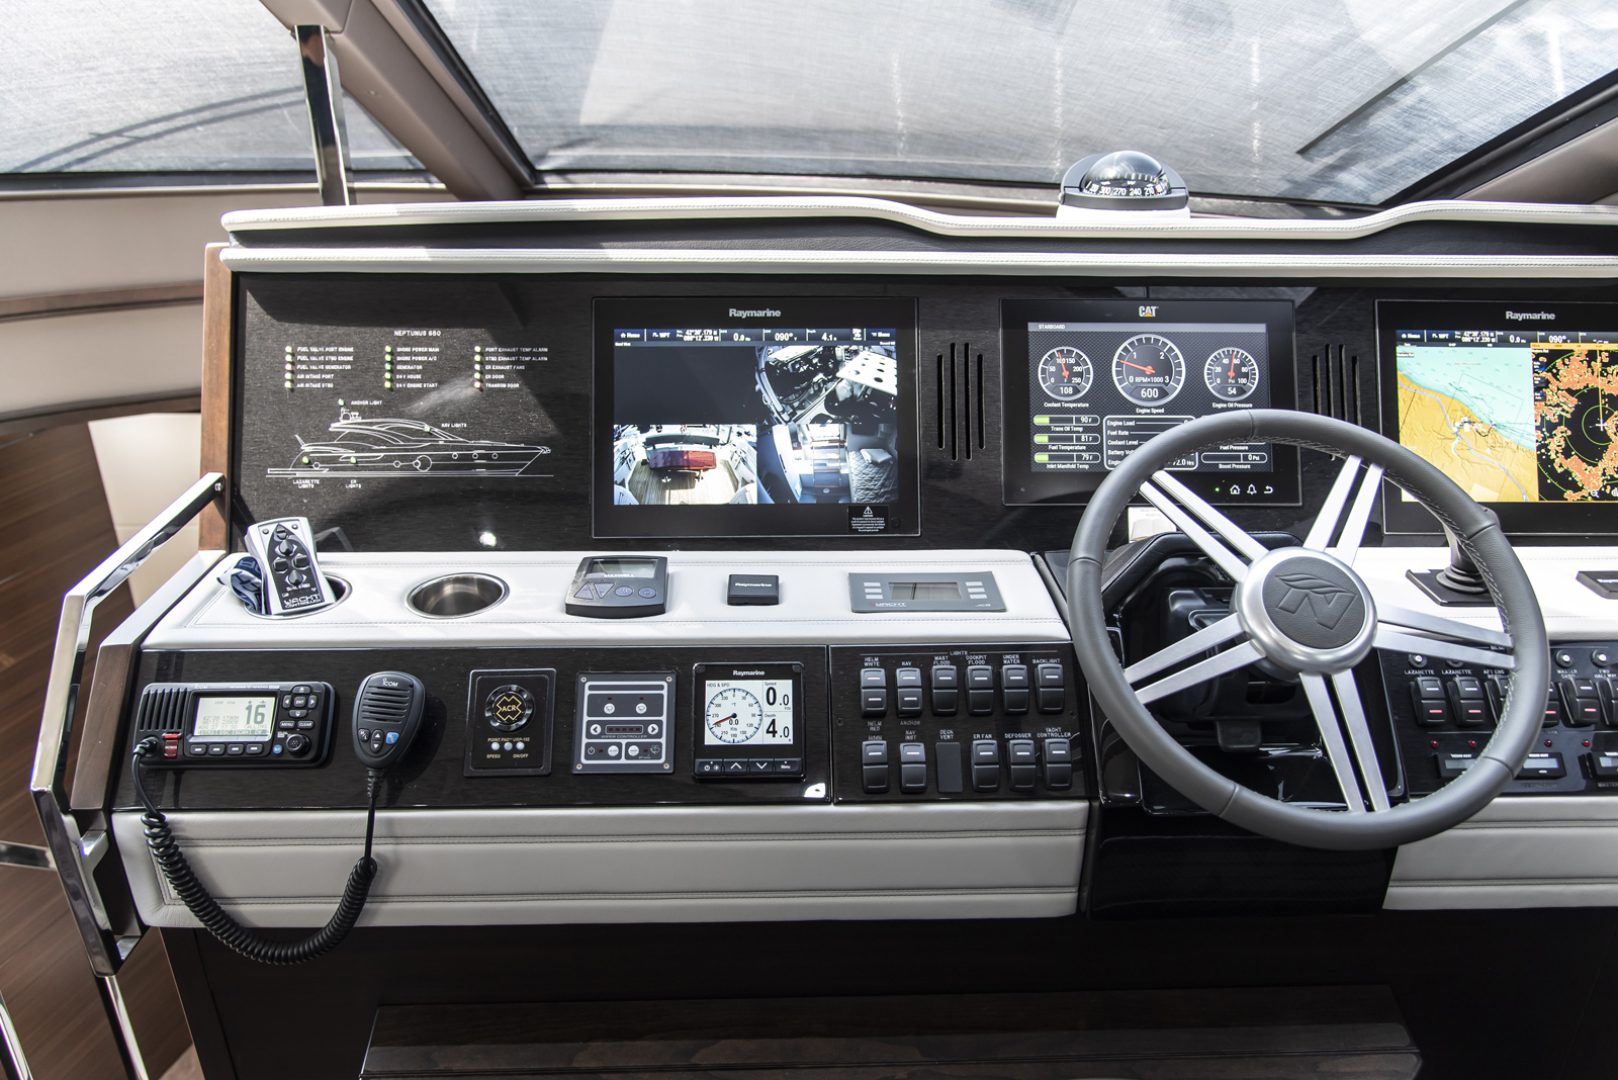 Neptunus-Motor Yacht Express 2018-LIQUID WISDOM Grand Haven-Michigan-United States-Helm to port-1484970 | Thumbnail